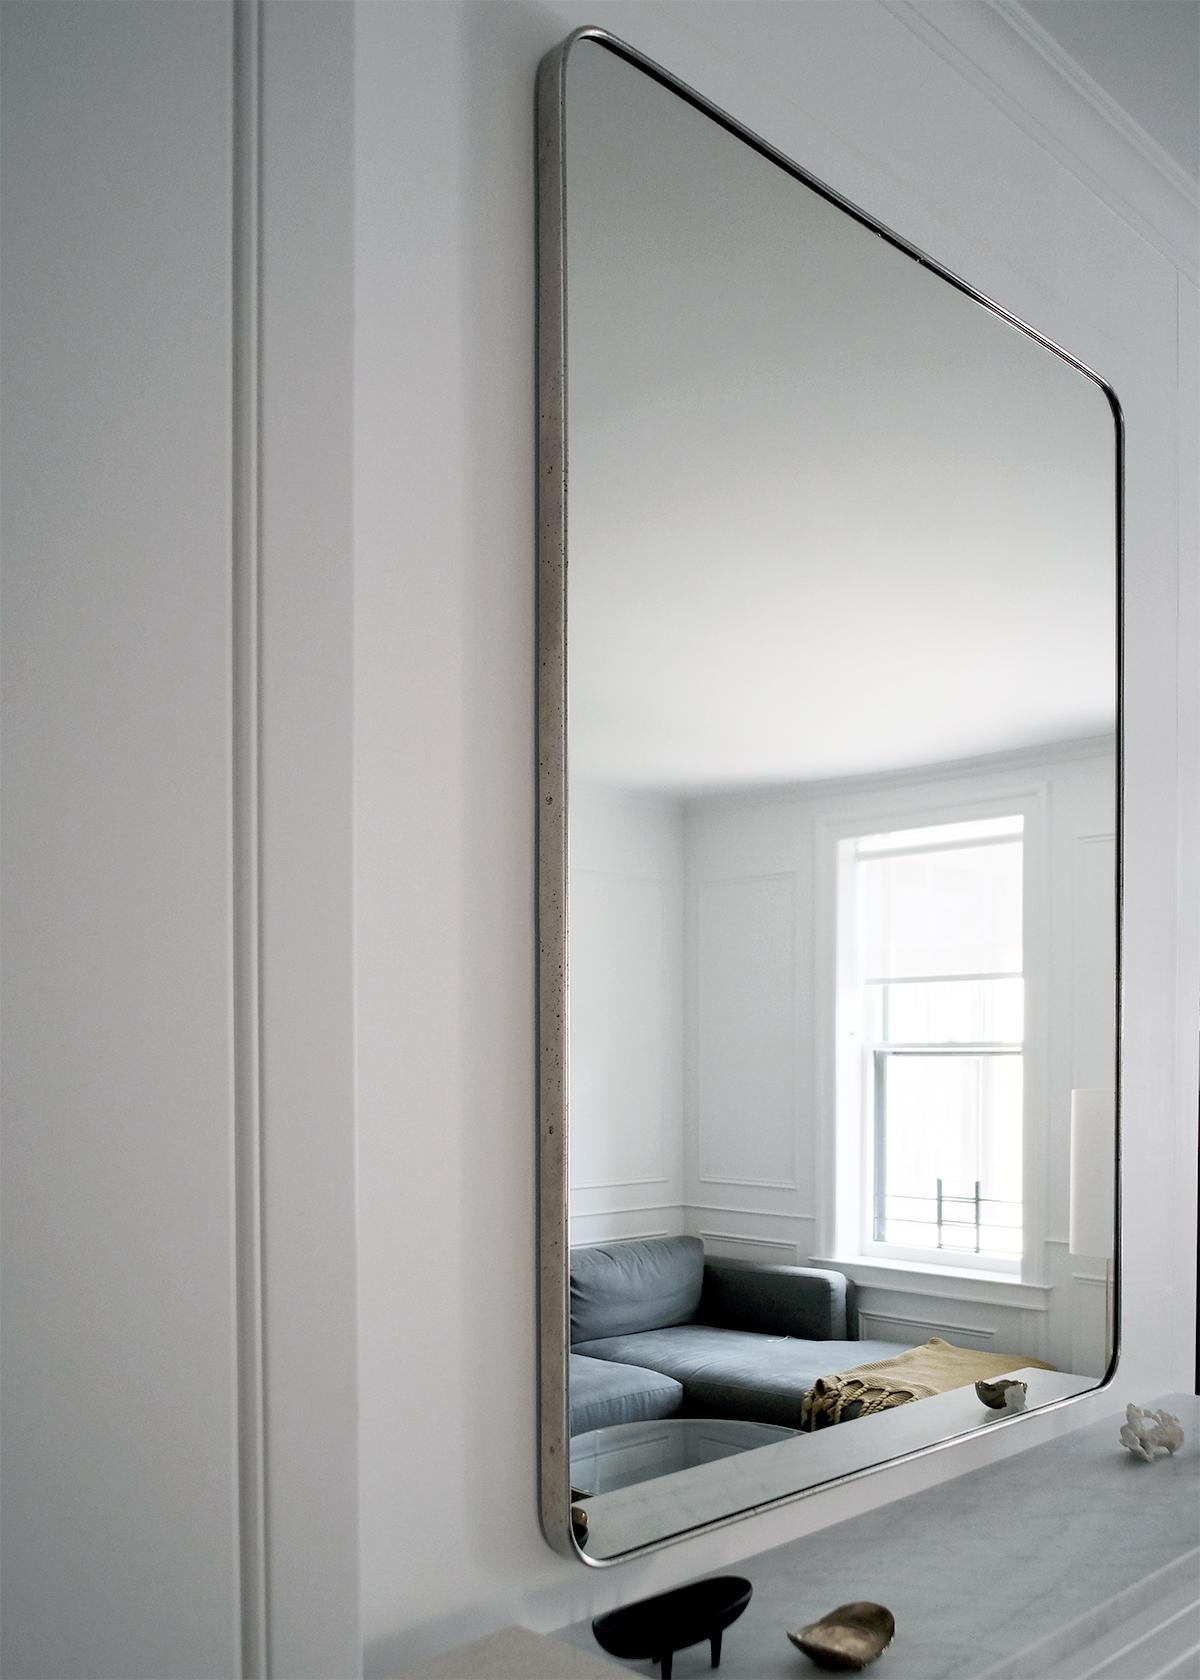 mirror3-1 small.jpeg